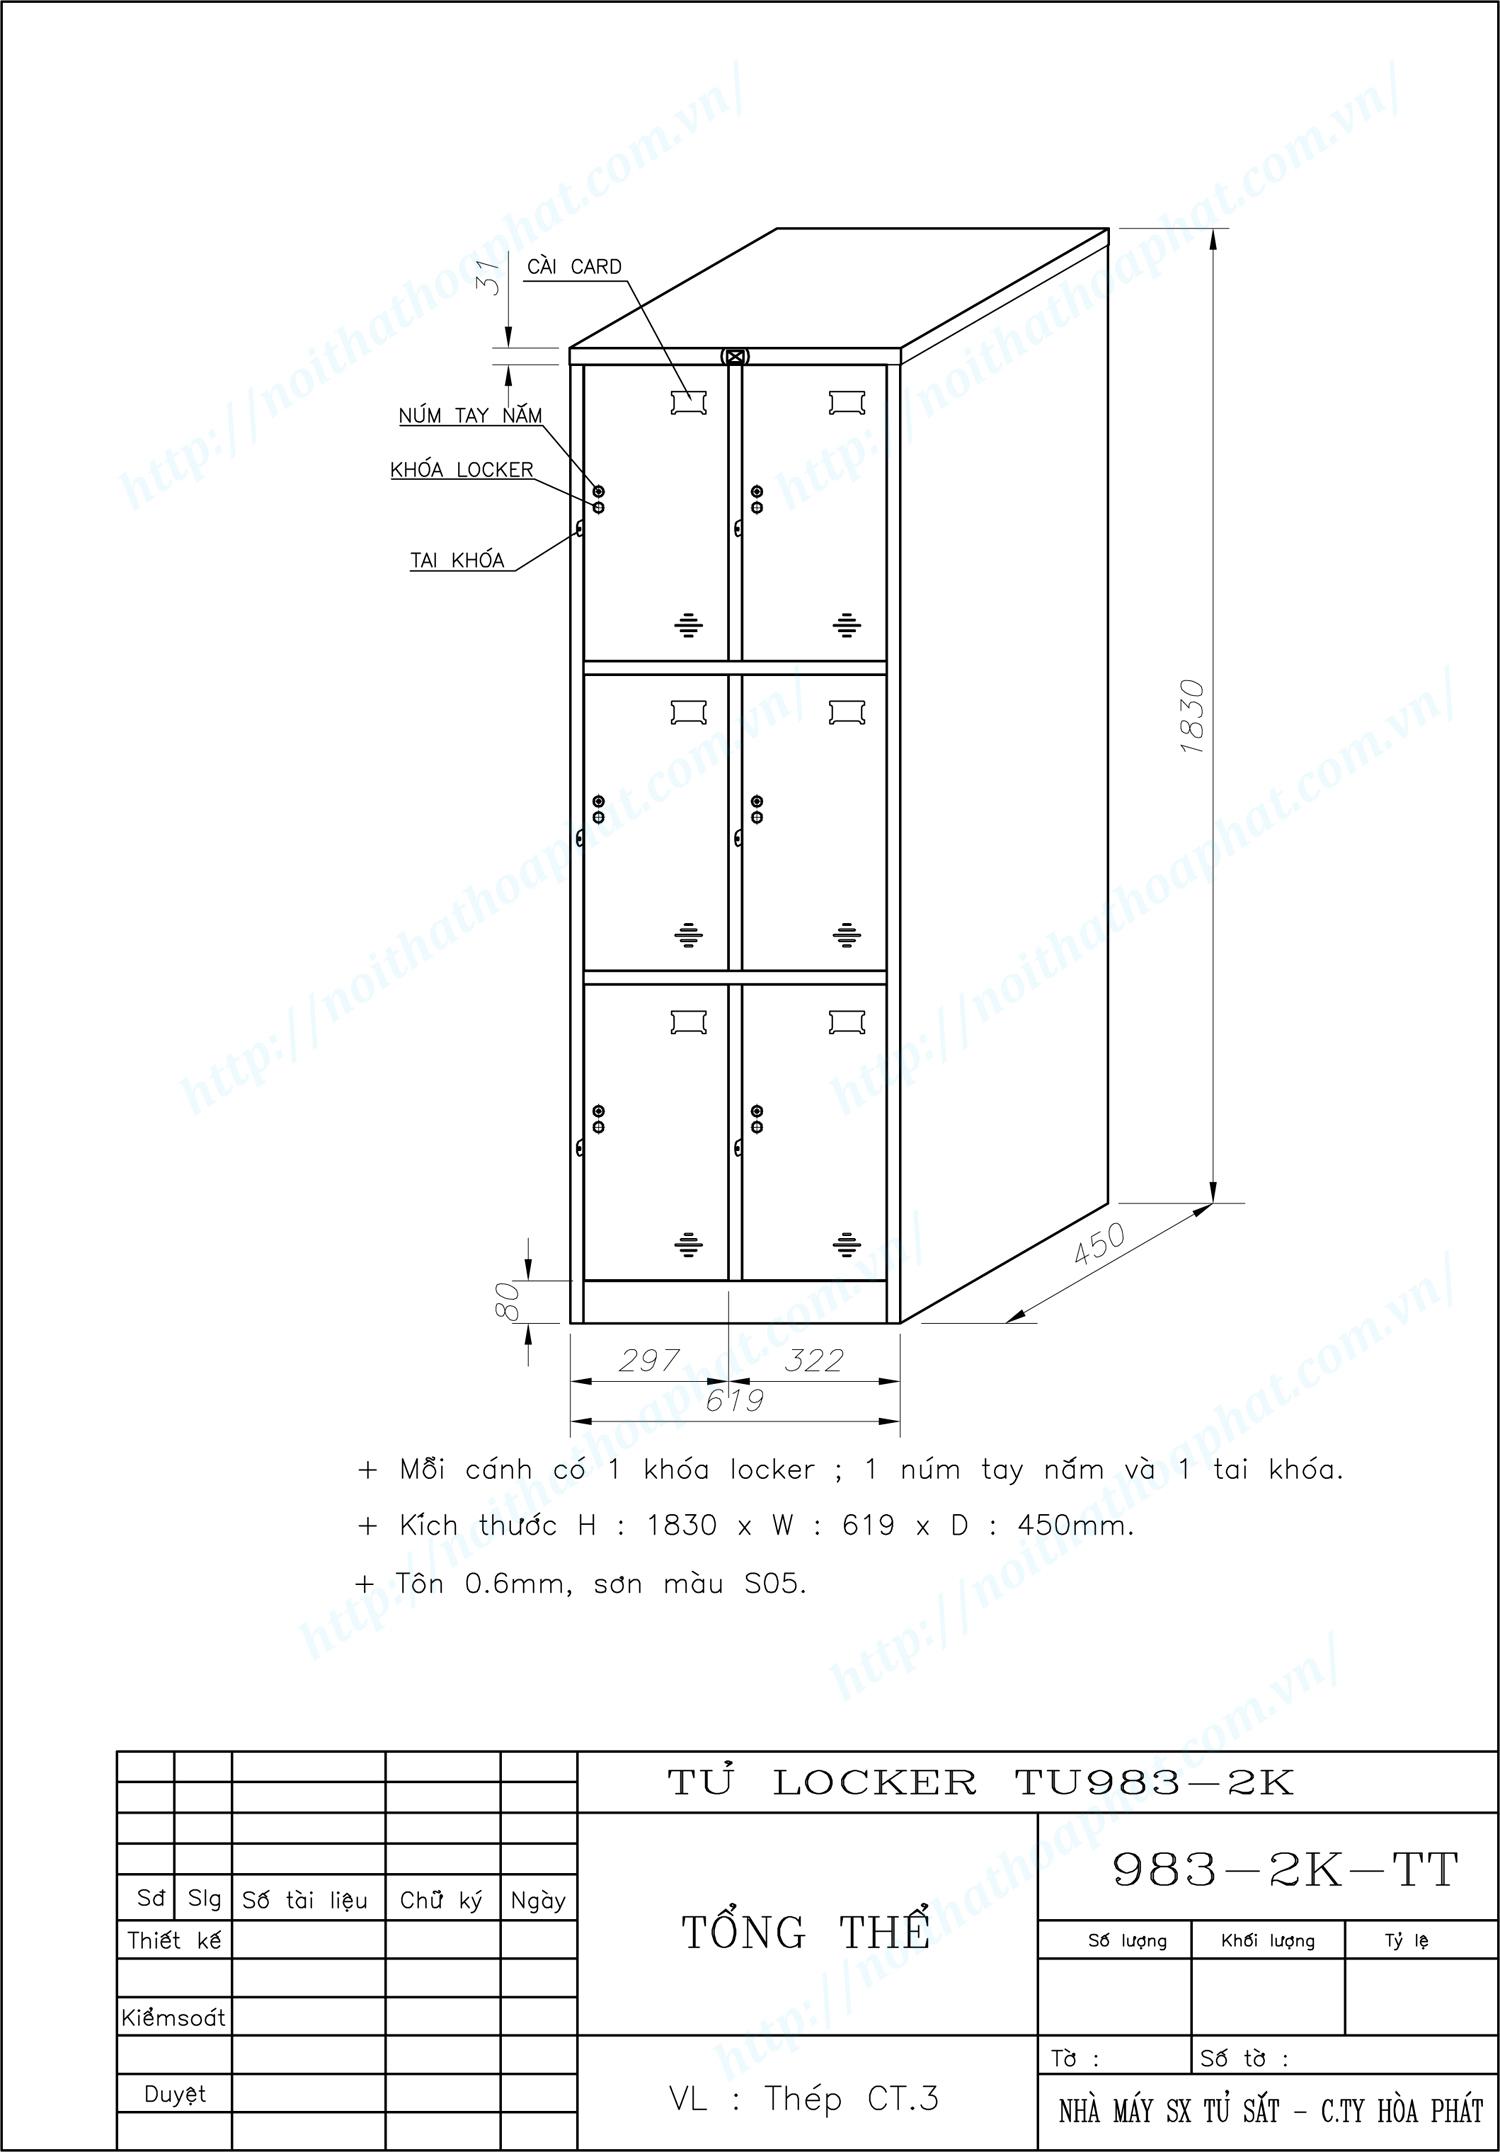 Bản vẽ kỹ thuật tủ locker 6 ngăn TU983-2K